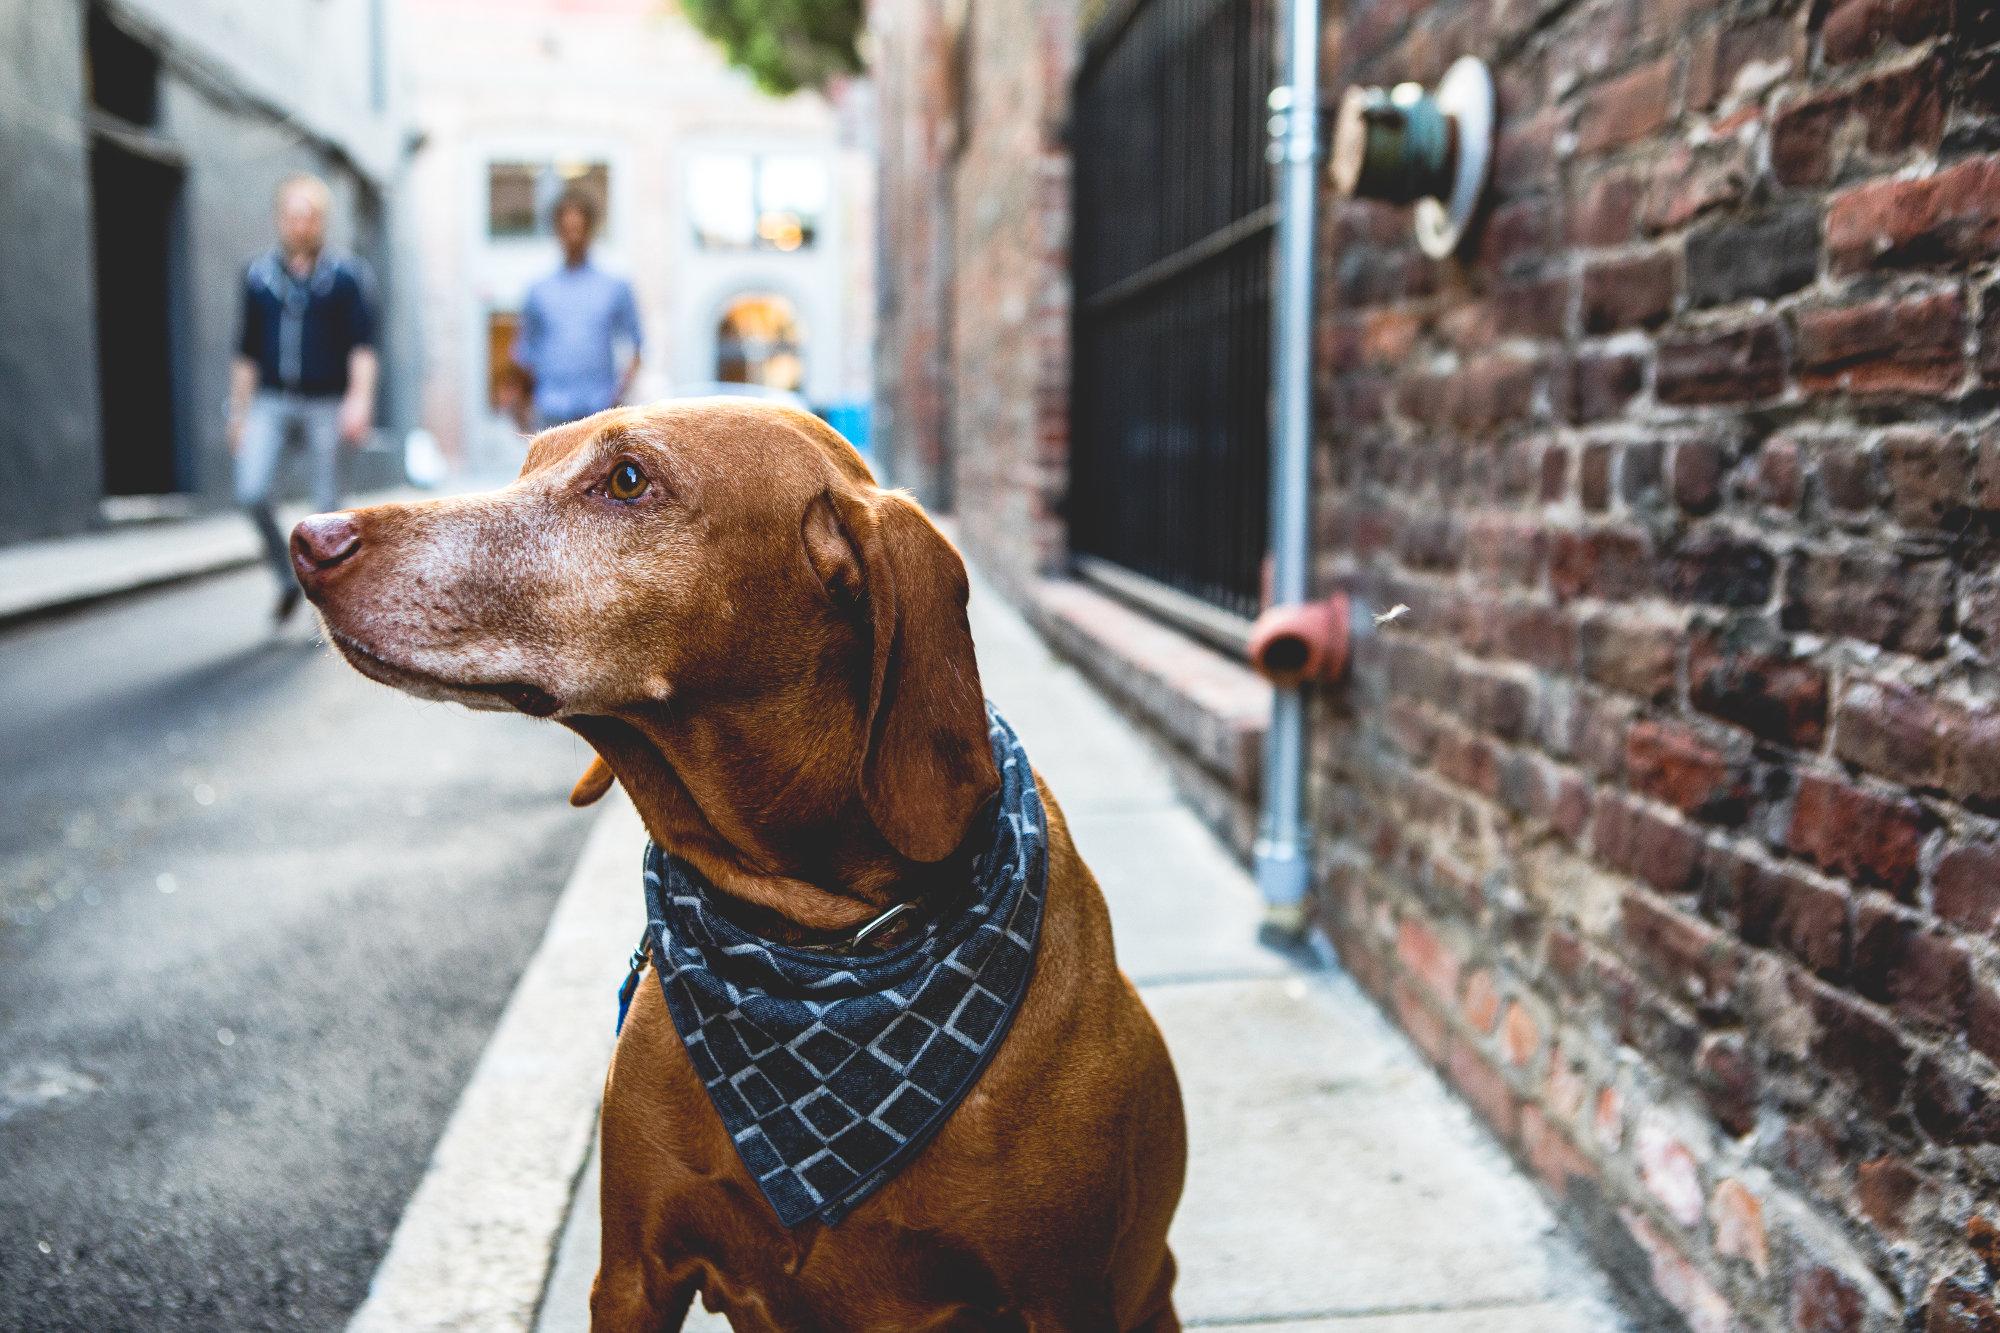 Pet friendly neighborhood